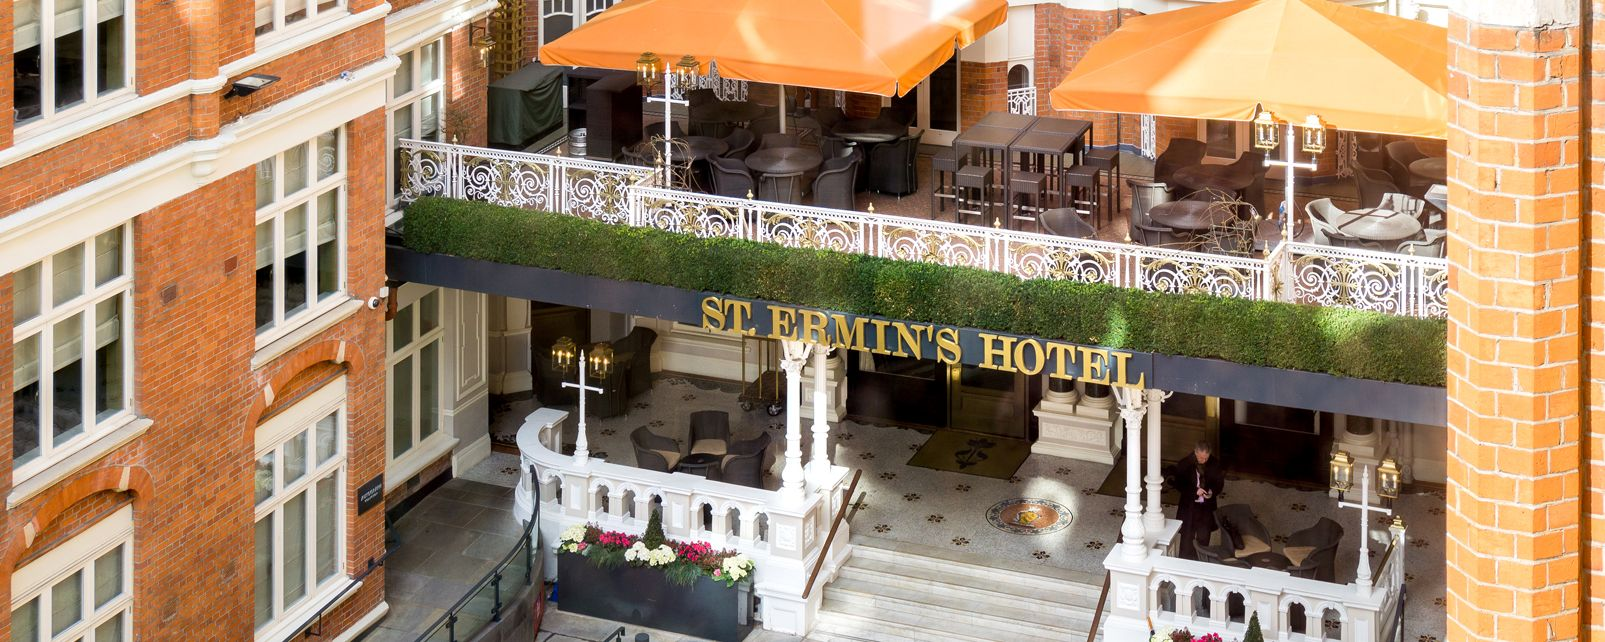 Hotel St Ermin's Hotel